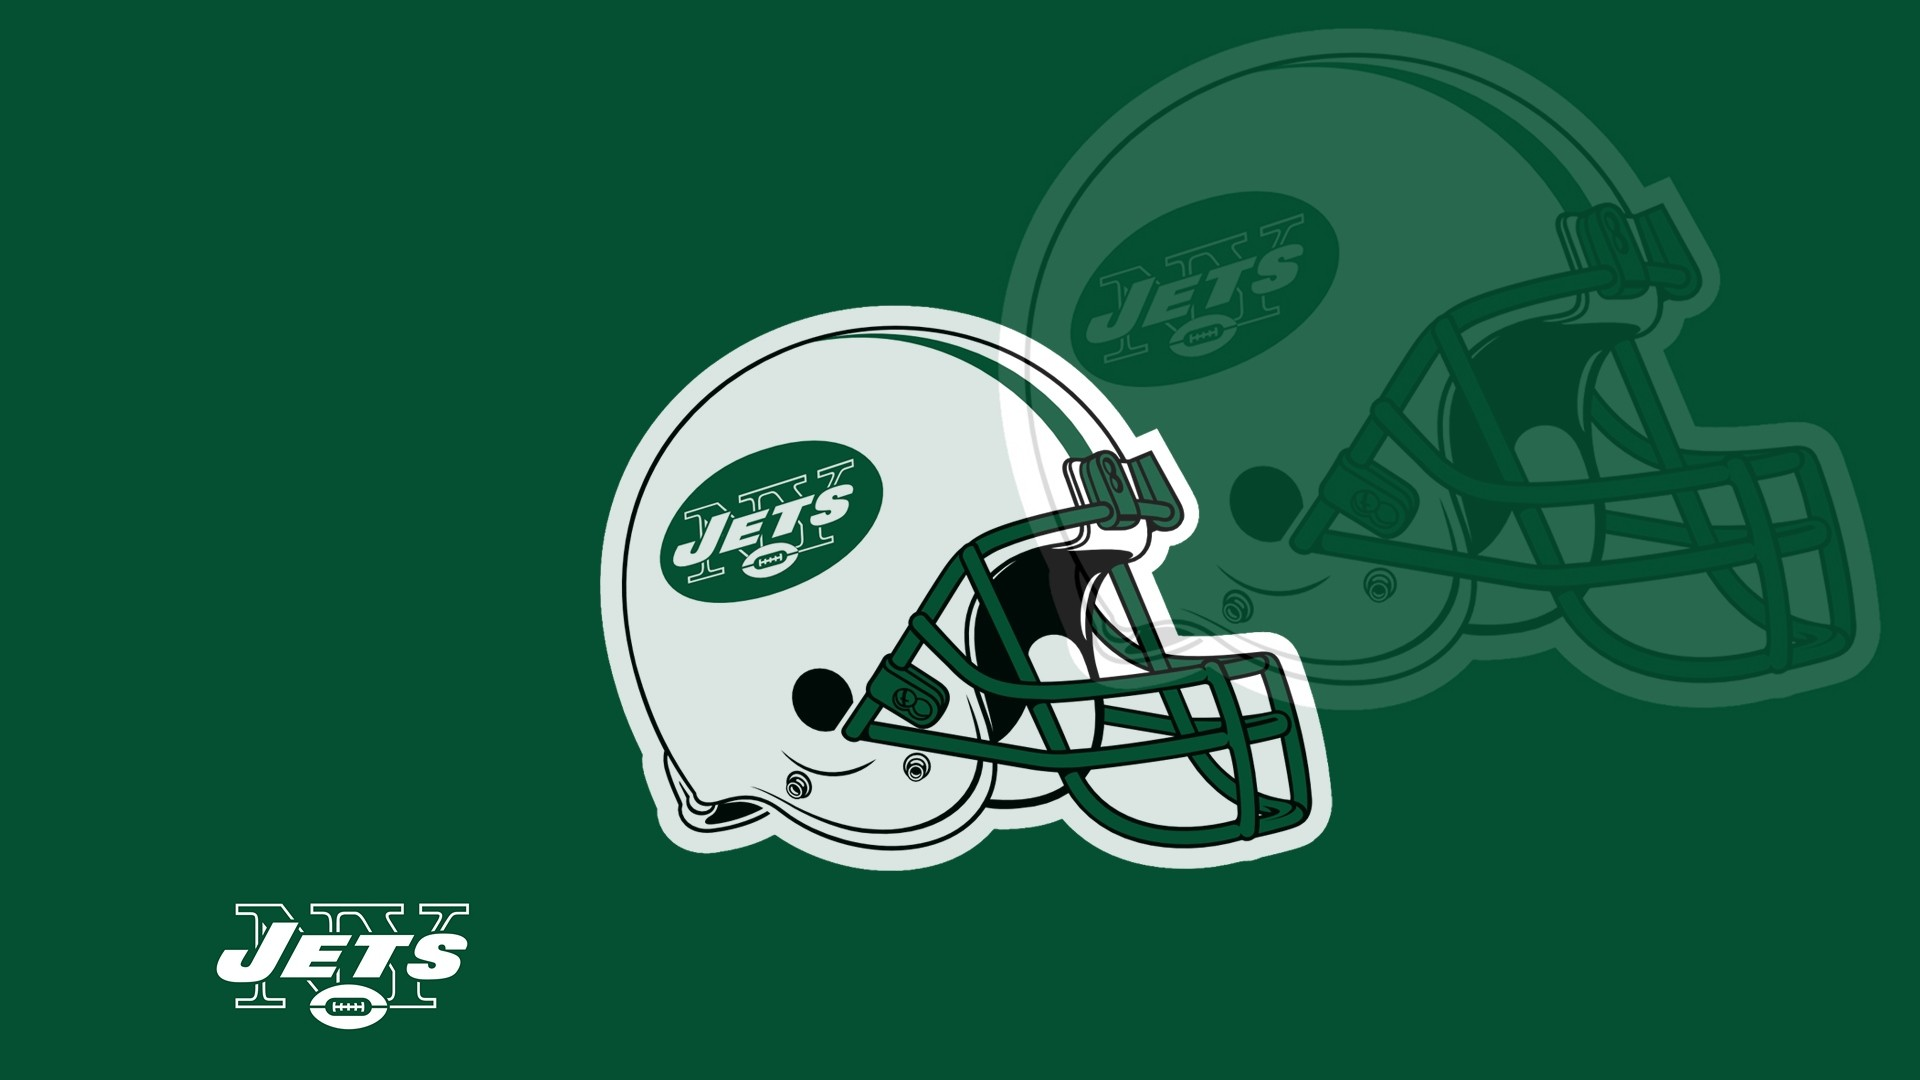 … new york jets nfl football dh wallpaper 157943 …